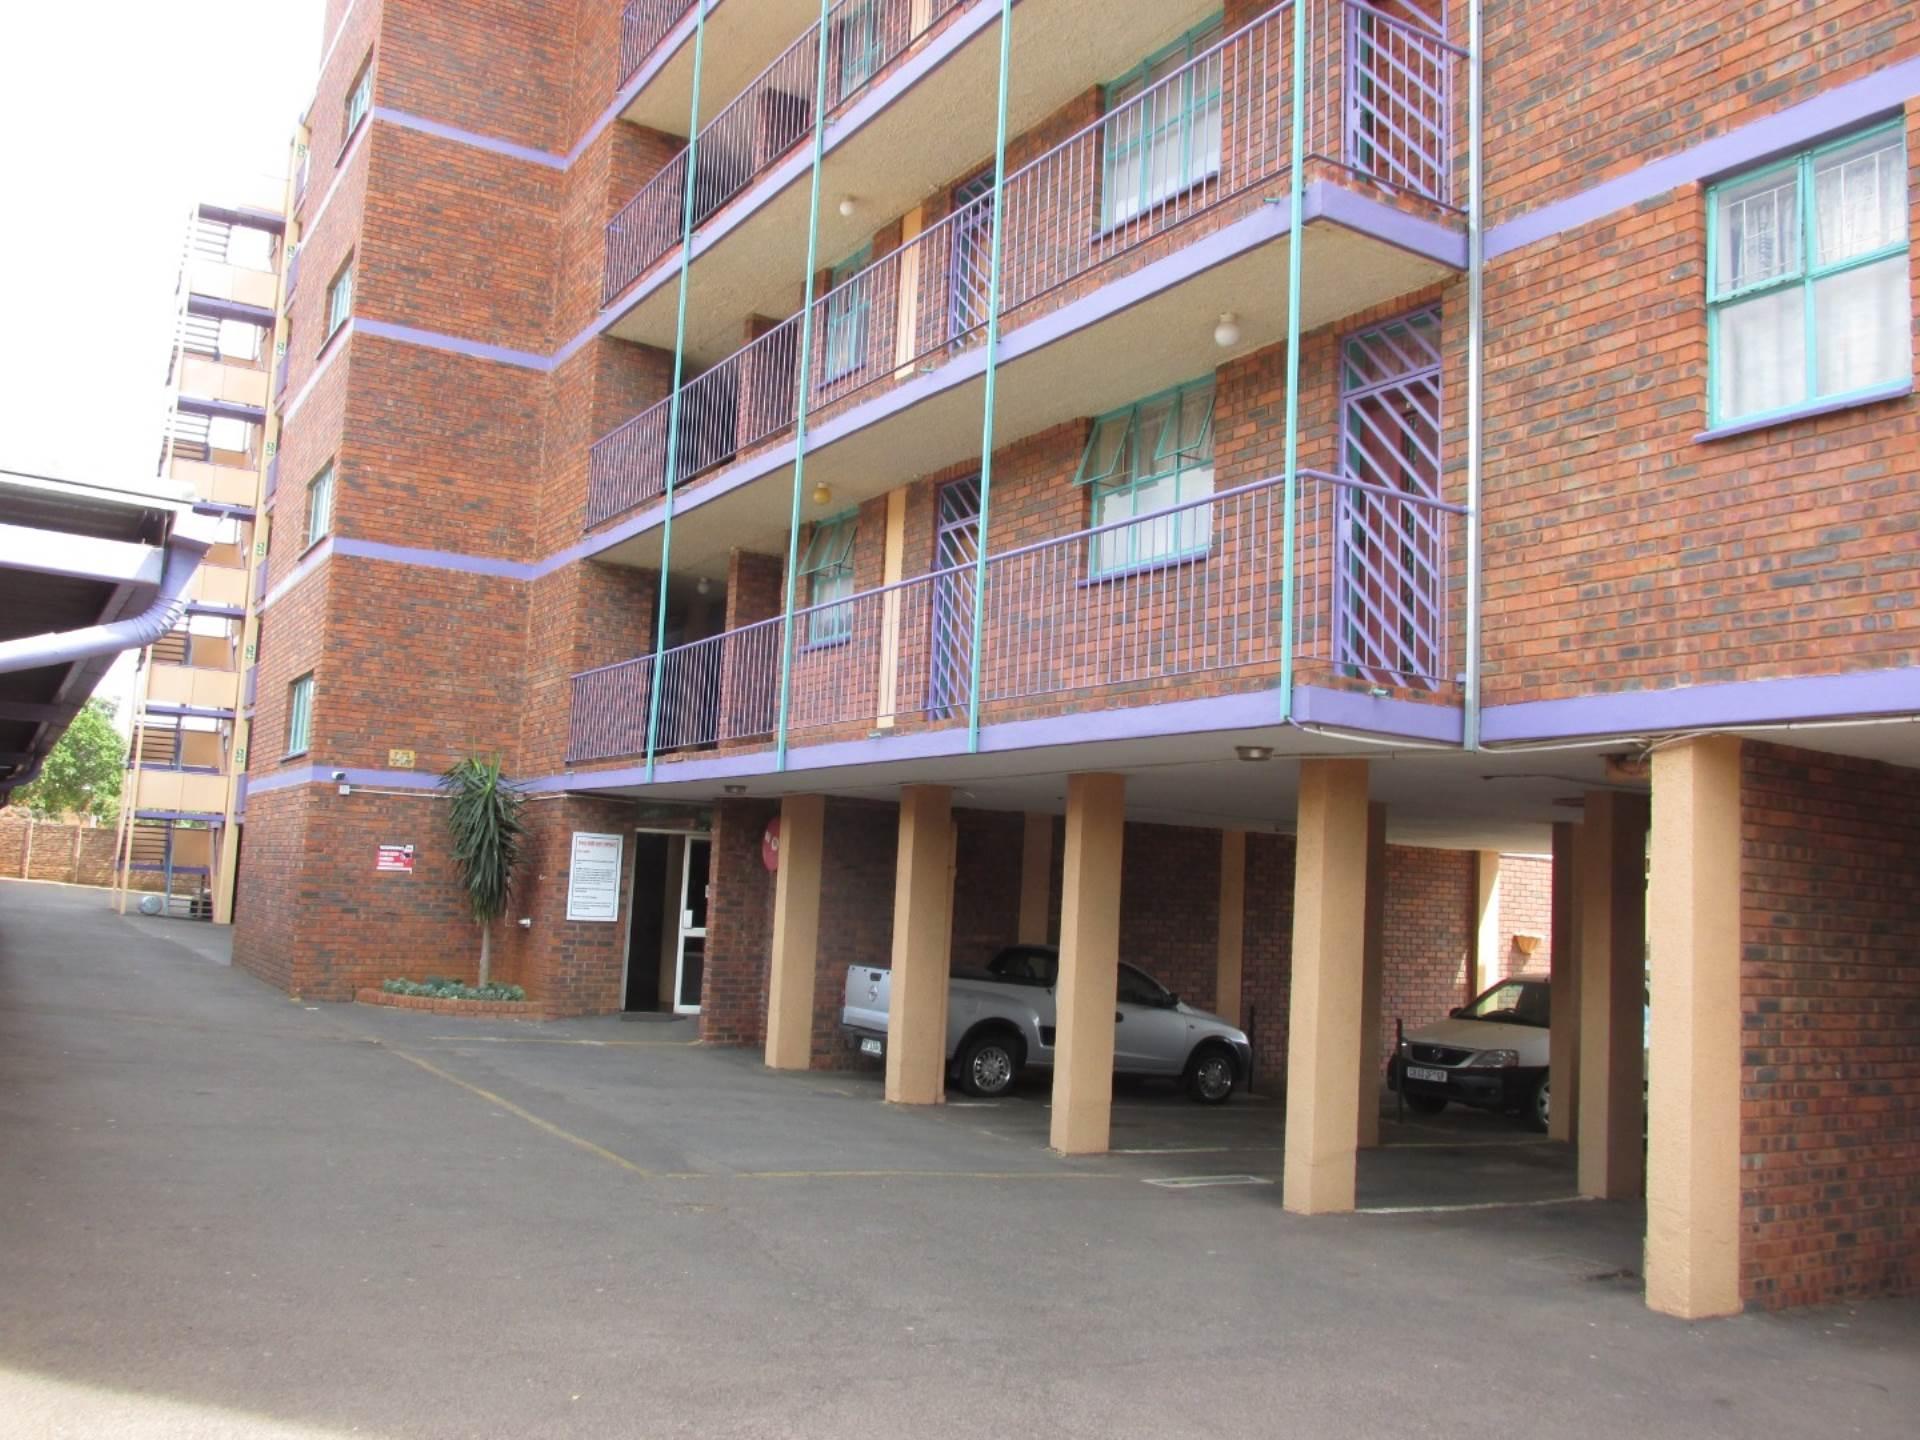 Pretoria North - Flat Rental Monthly in PRETORIA NORTH